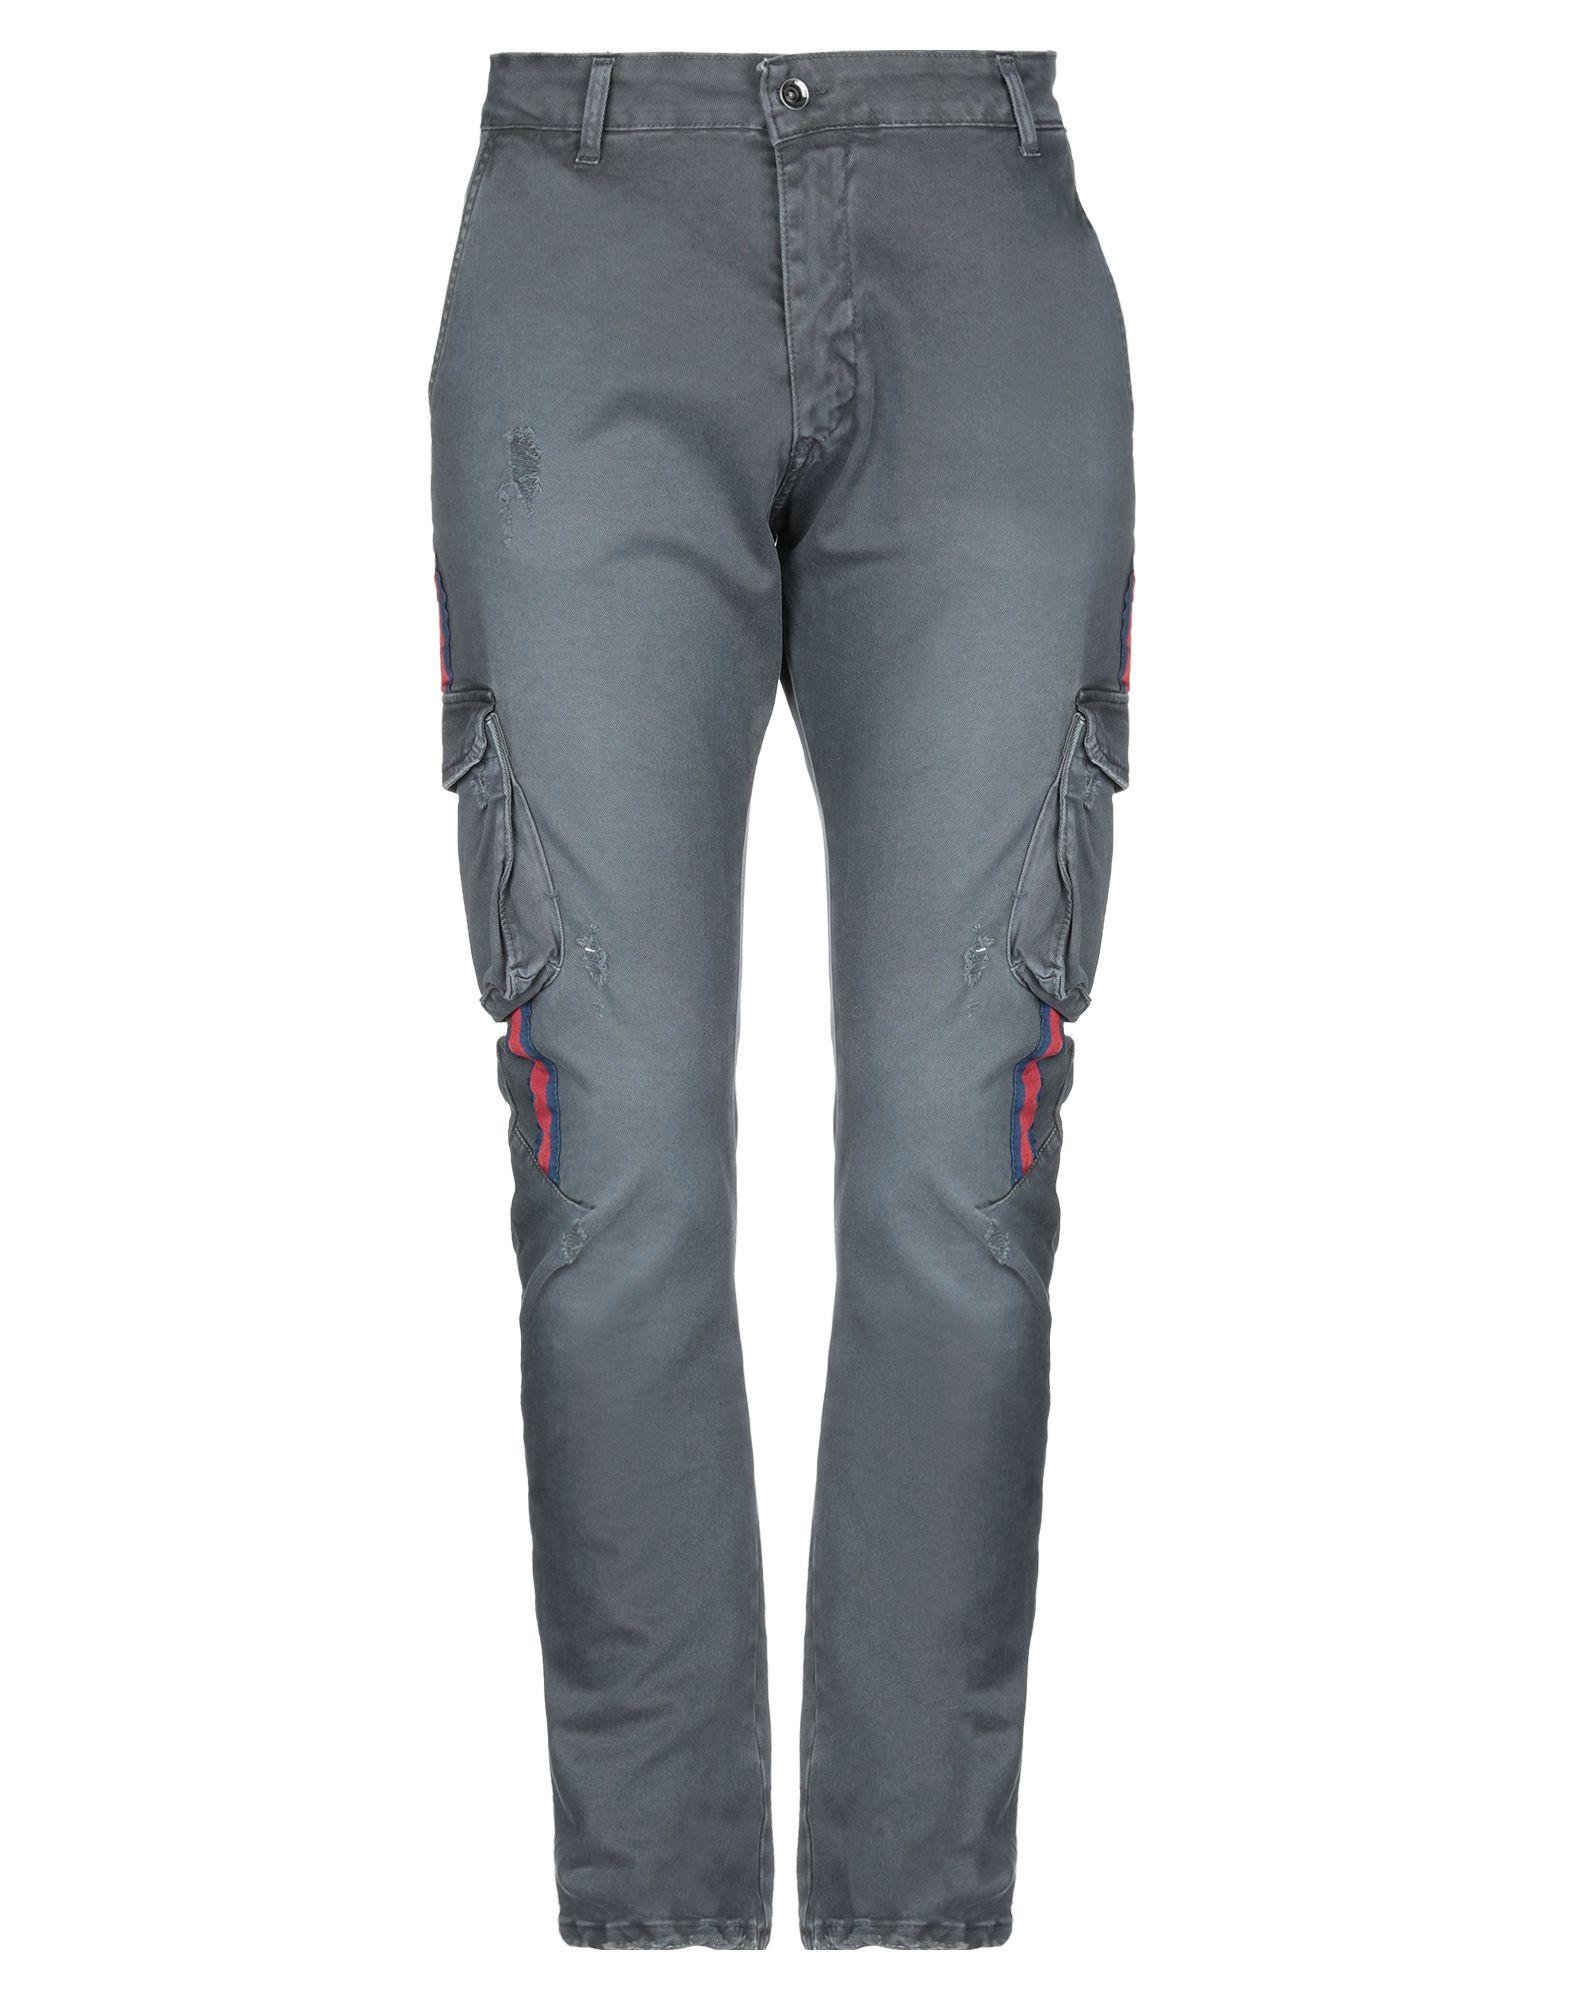 Cargo Klixs Jeans herren - 13358096TM